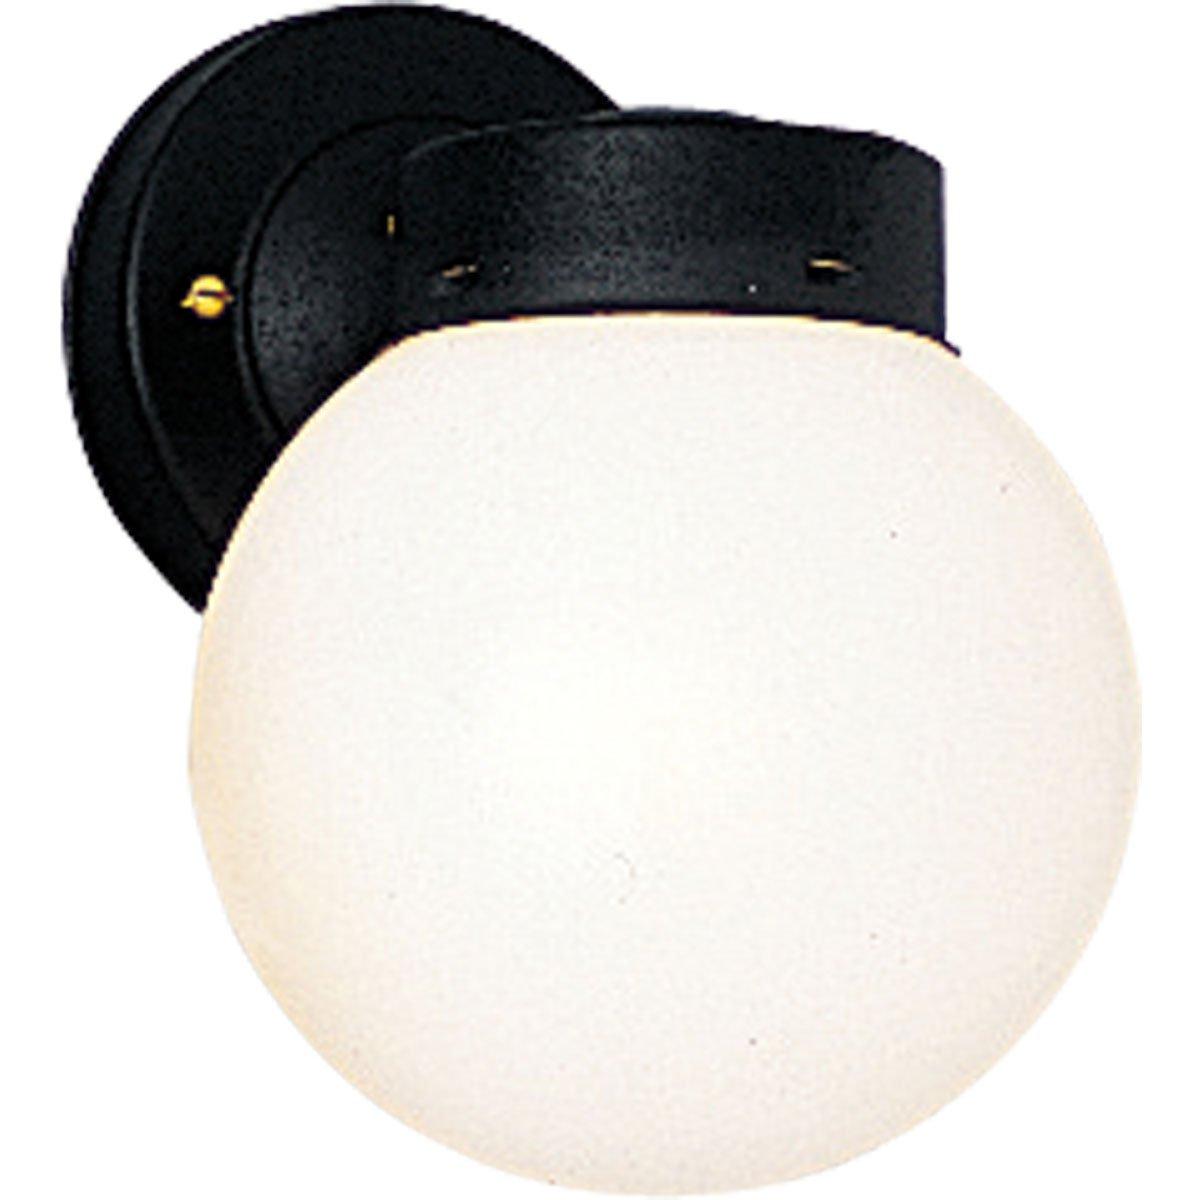 Progress Lighting P5604-31 Powder-Coated Finish White 6 Inch Glass Globe, Black